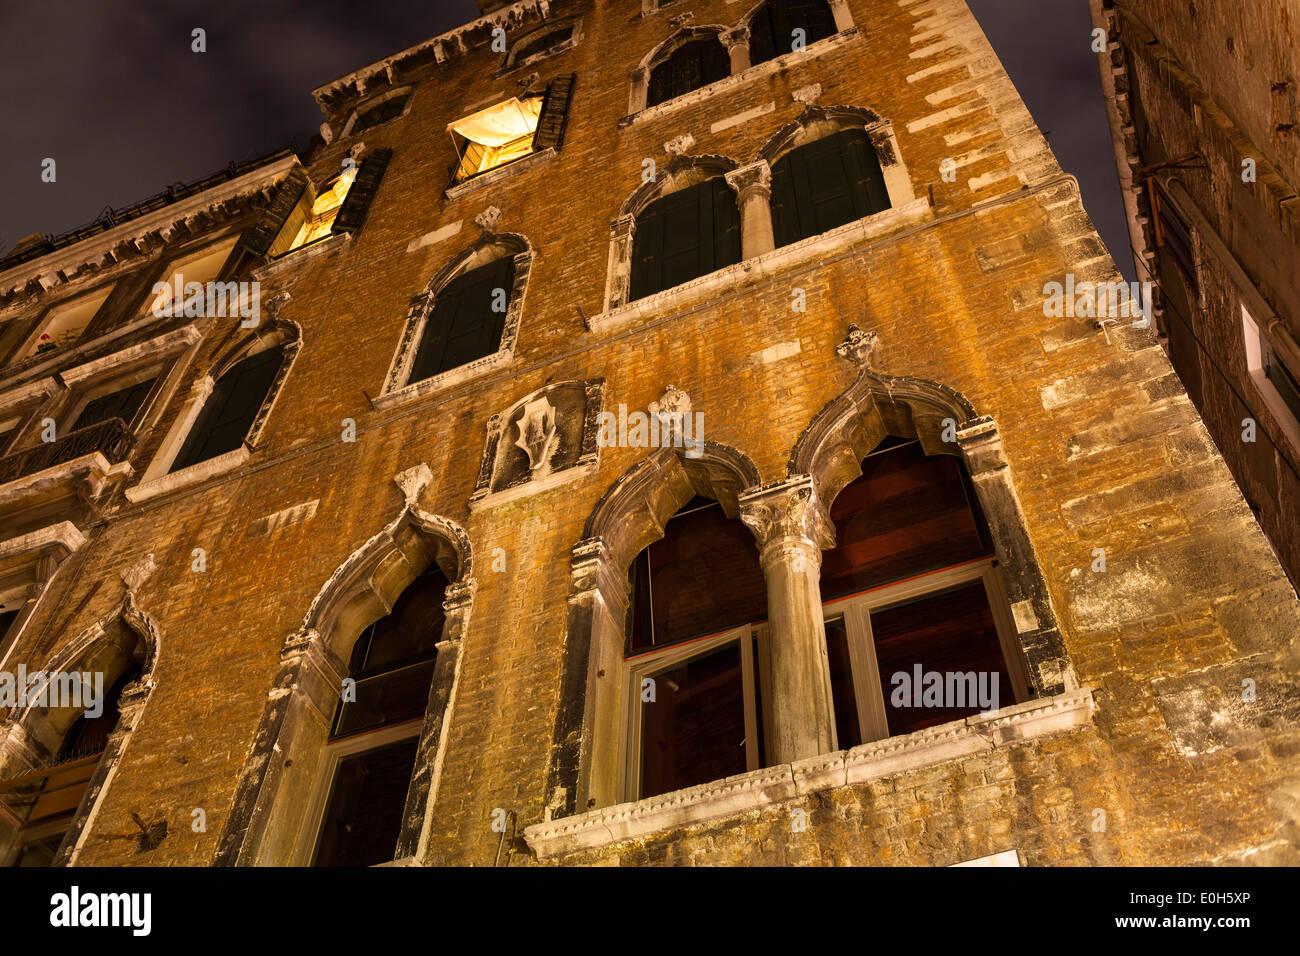 Façade de maison, Venise la nuit, Vénétie, Italie, Europe Photo Stock